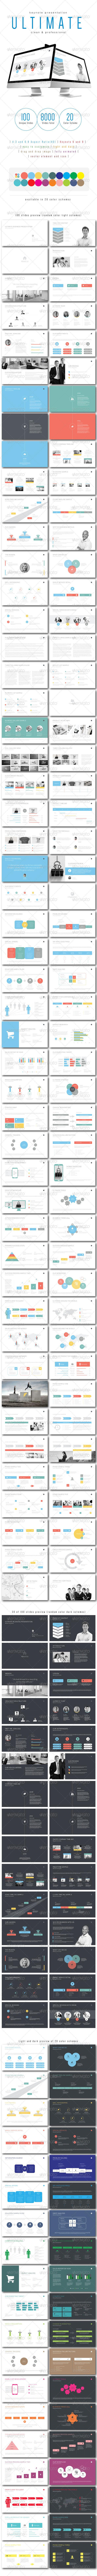 GraphicRiver Multipurpose Keynote Presentation Vol 07 8120259